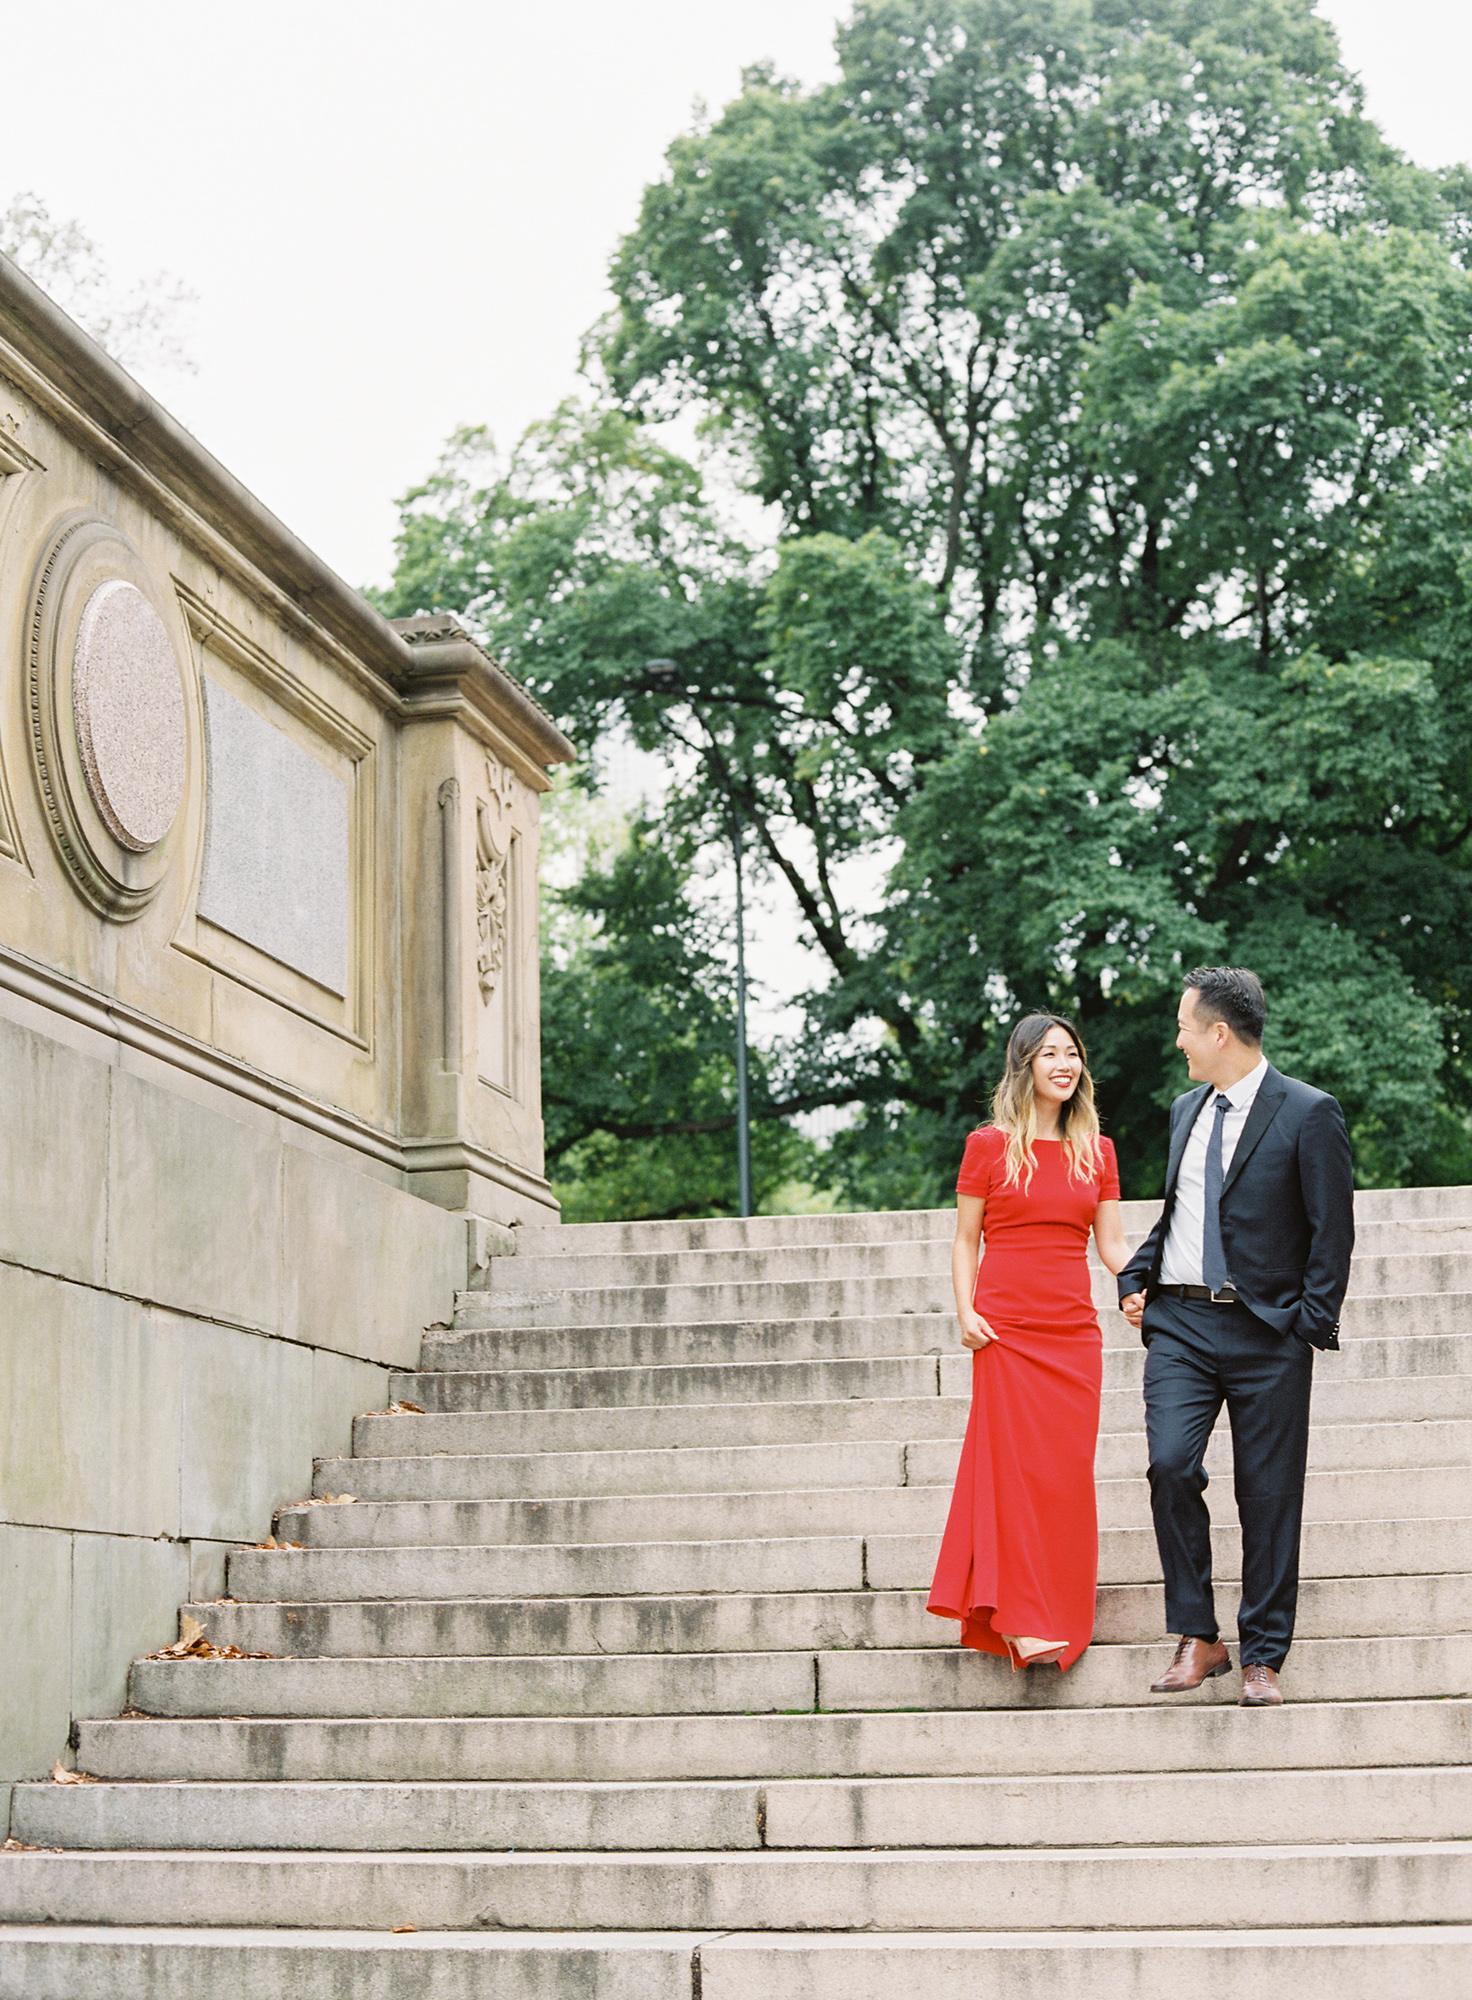 New-York-Film-Engagement-Session-Brooklyn-Bridge-Central-Park-16.jpg